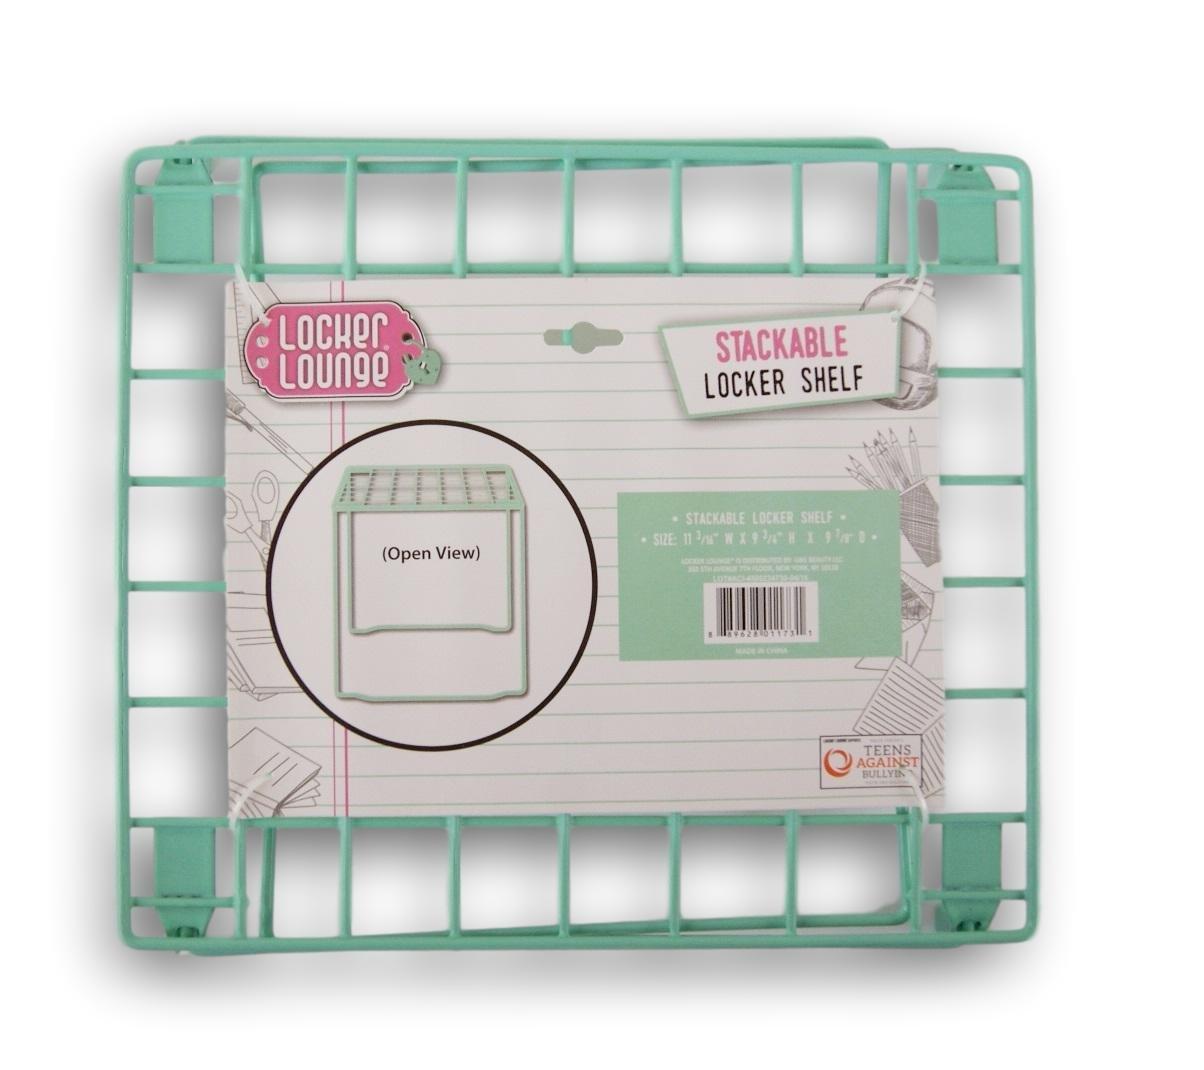 Locker Lounge Stackable Locker Shelf - 11 3/16 x 9 3/4 x 9 7/8 Inches (Mint Green)